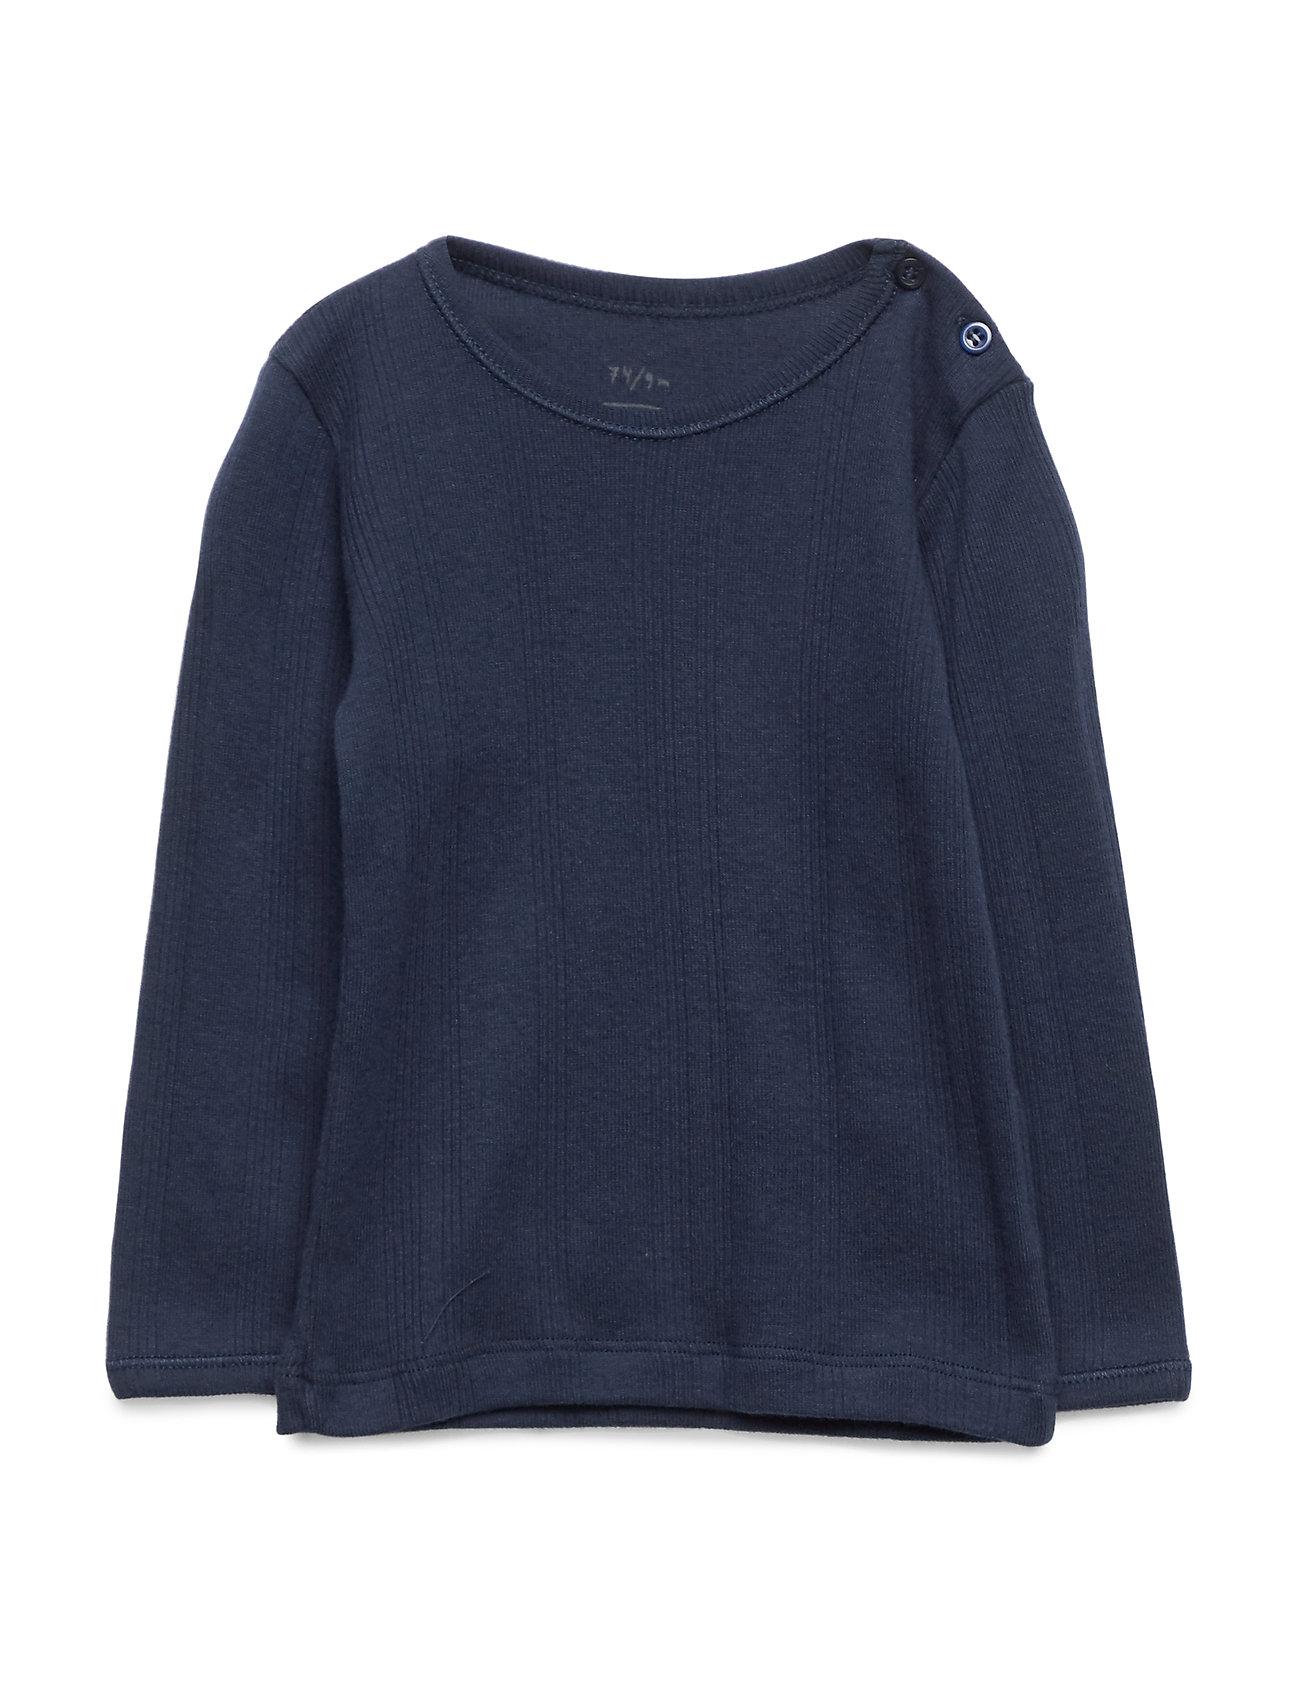 Noa Noa Miniature T-shirt - NAVY BLAZER